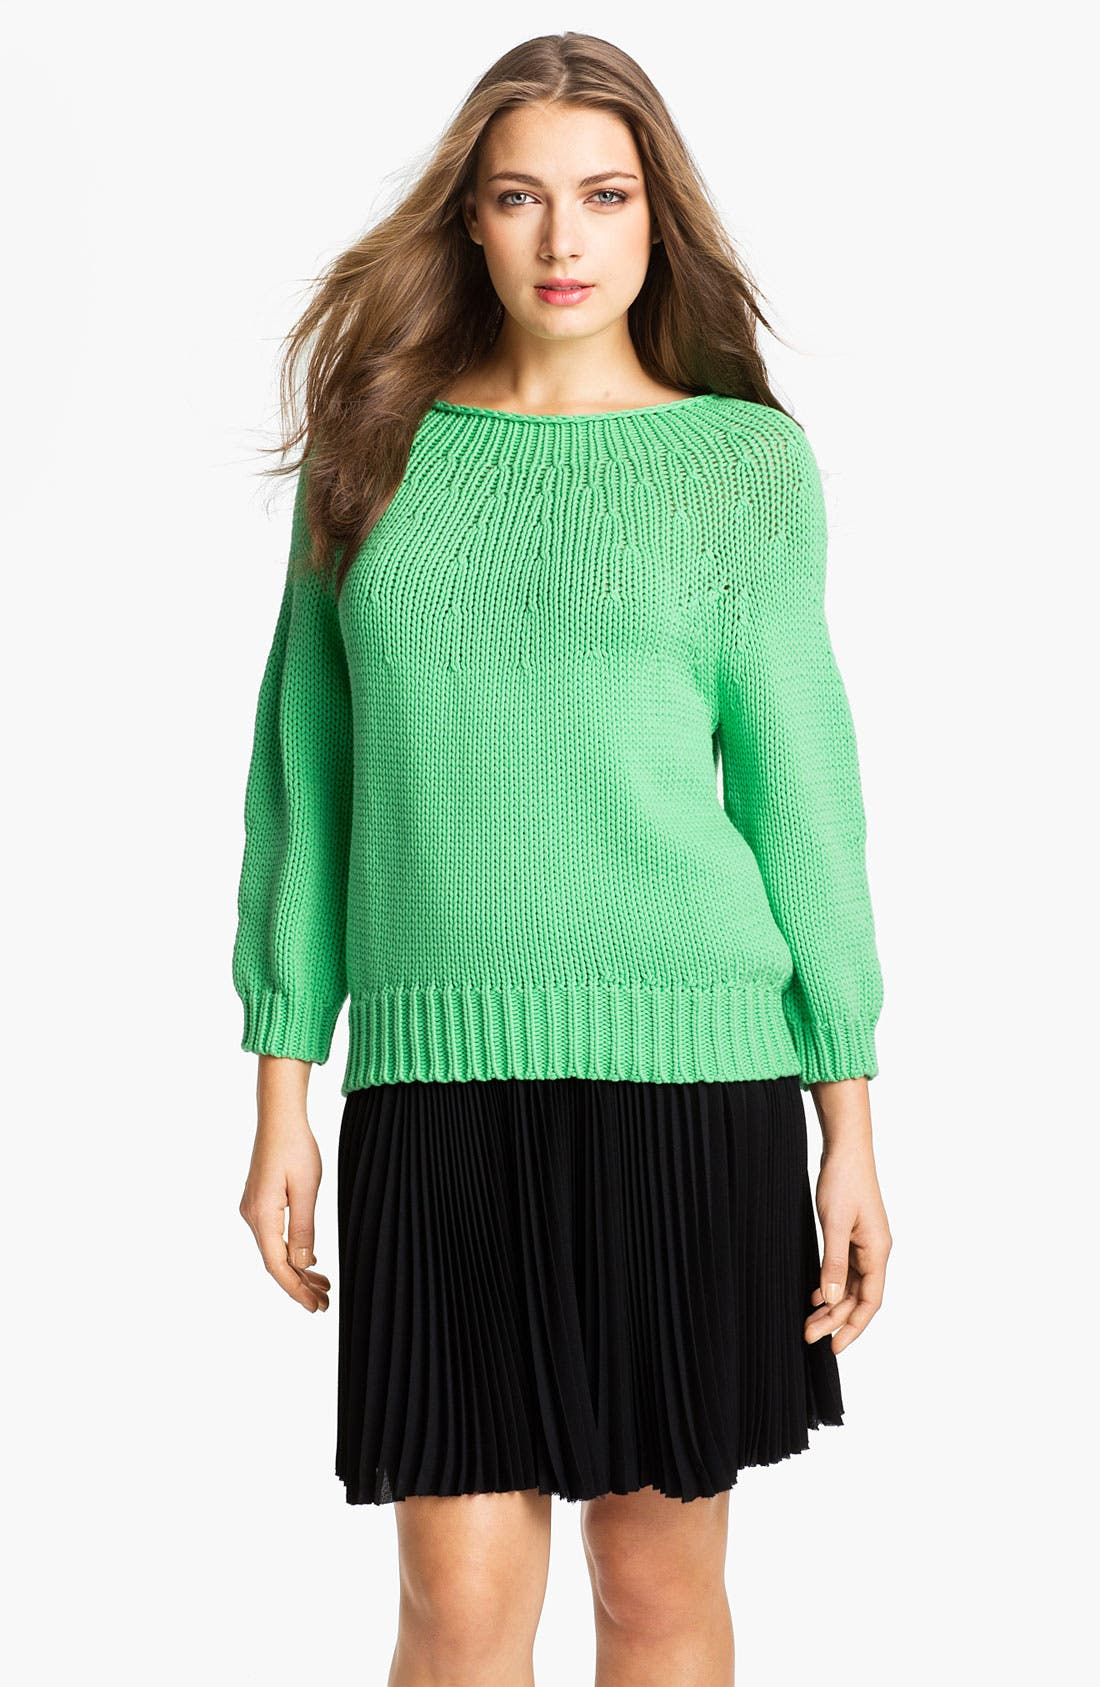 Alternate Image 1 Selected - Diane von Furstenberg 'Averill' Sweater